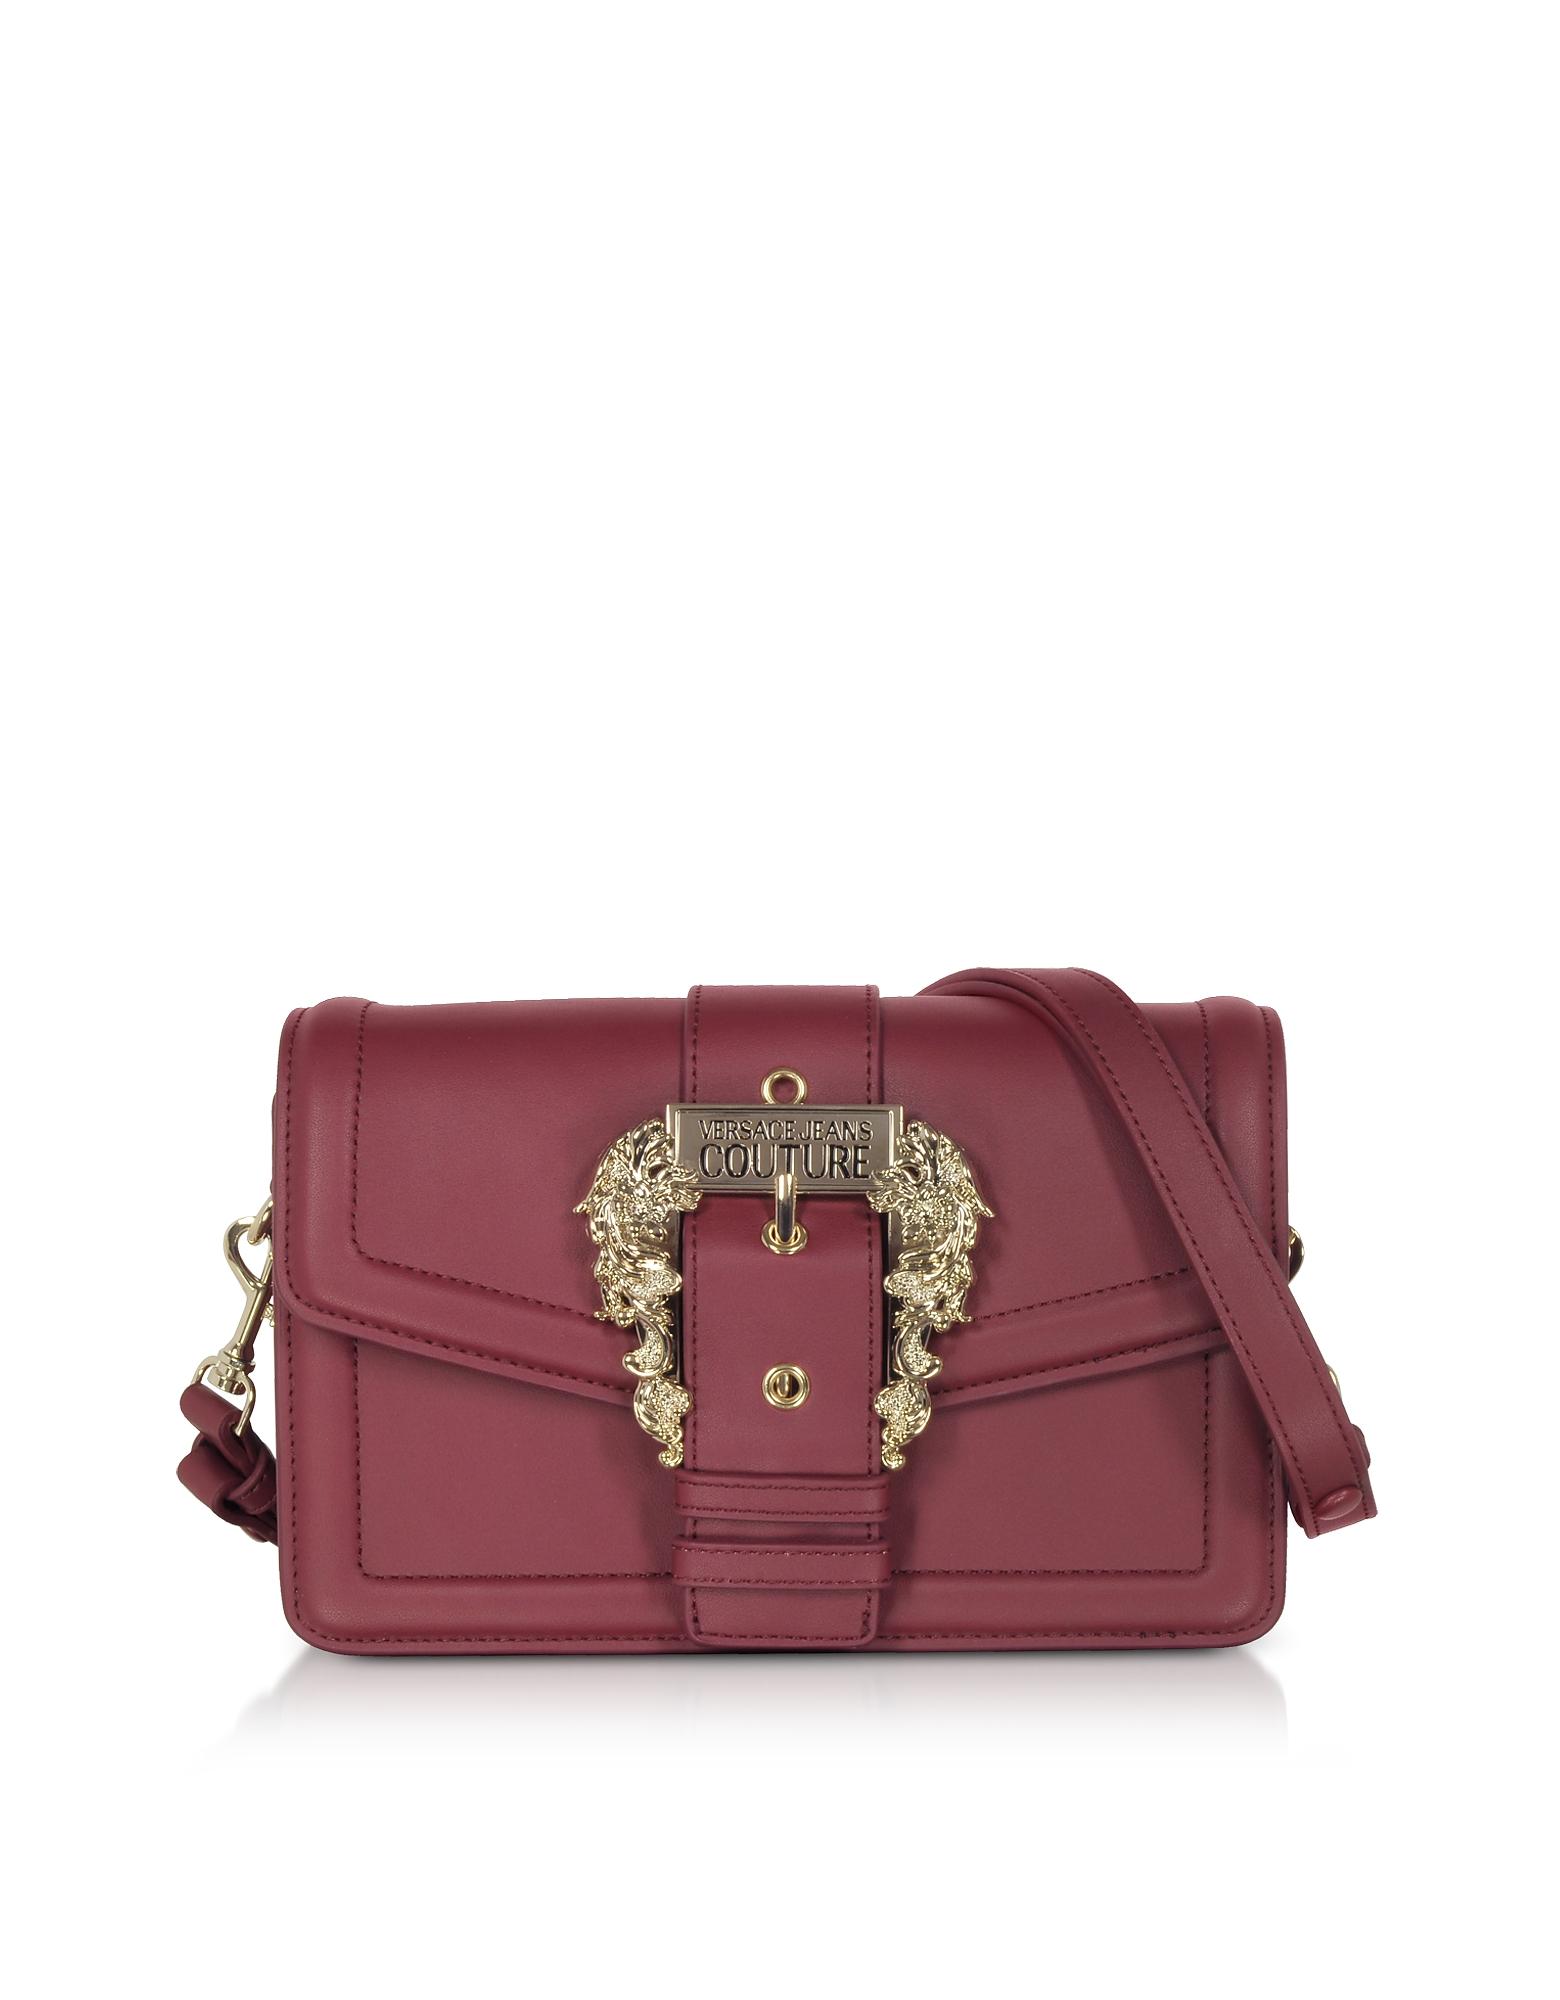 Burgundy Leather Crossbody Bag w/ Buckle